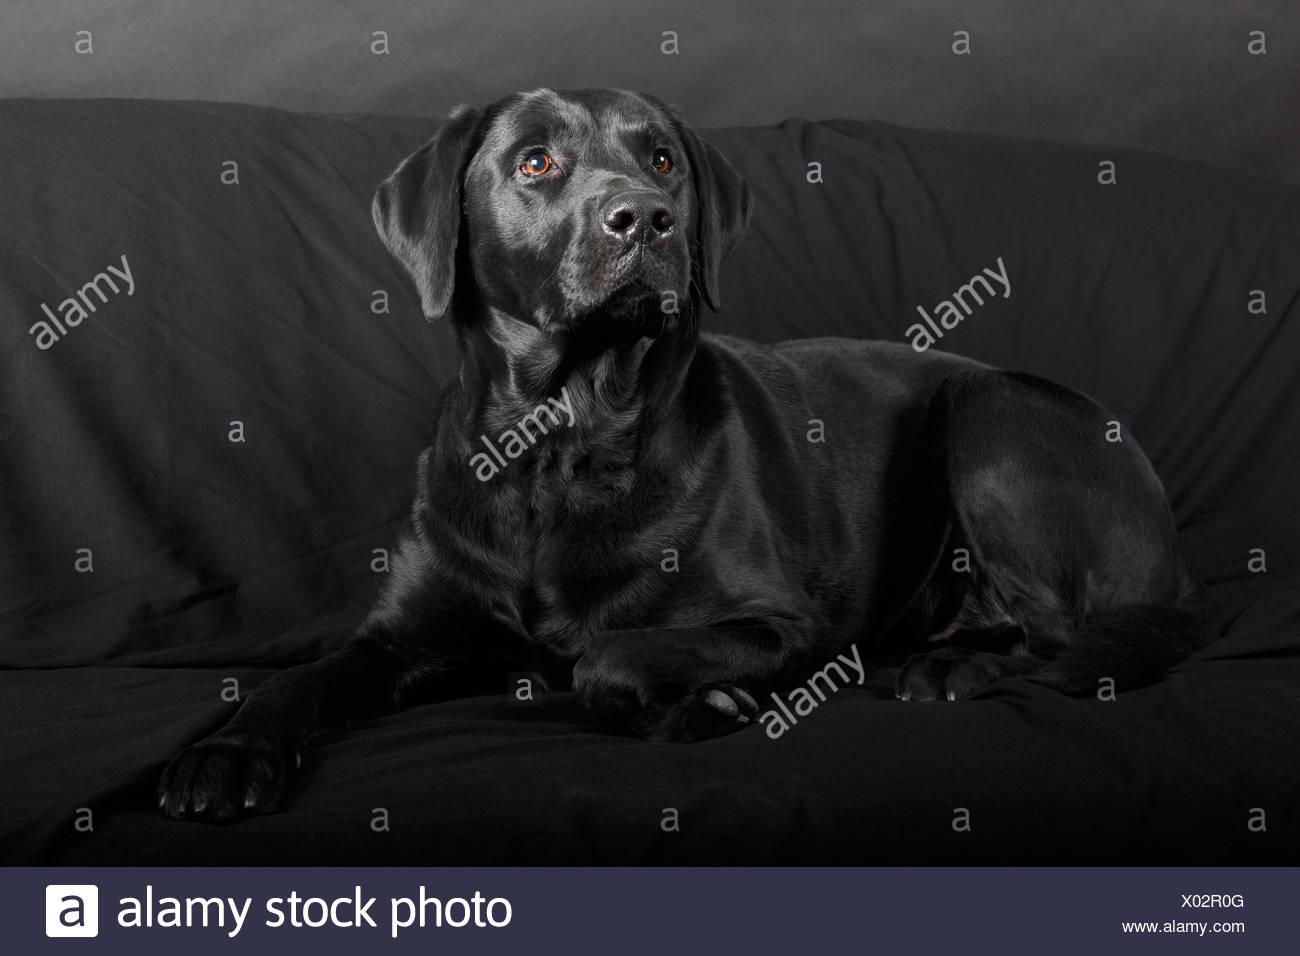 Black Labrador Retriever, male, lying on a black sofa, Germany - Stock Image